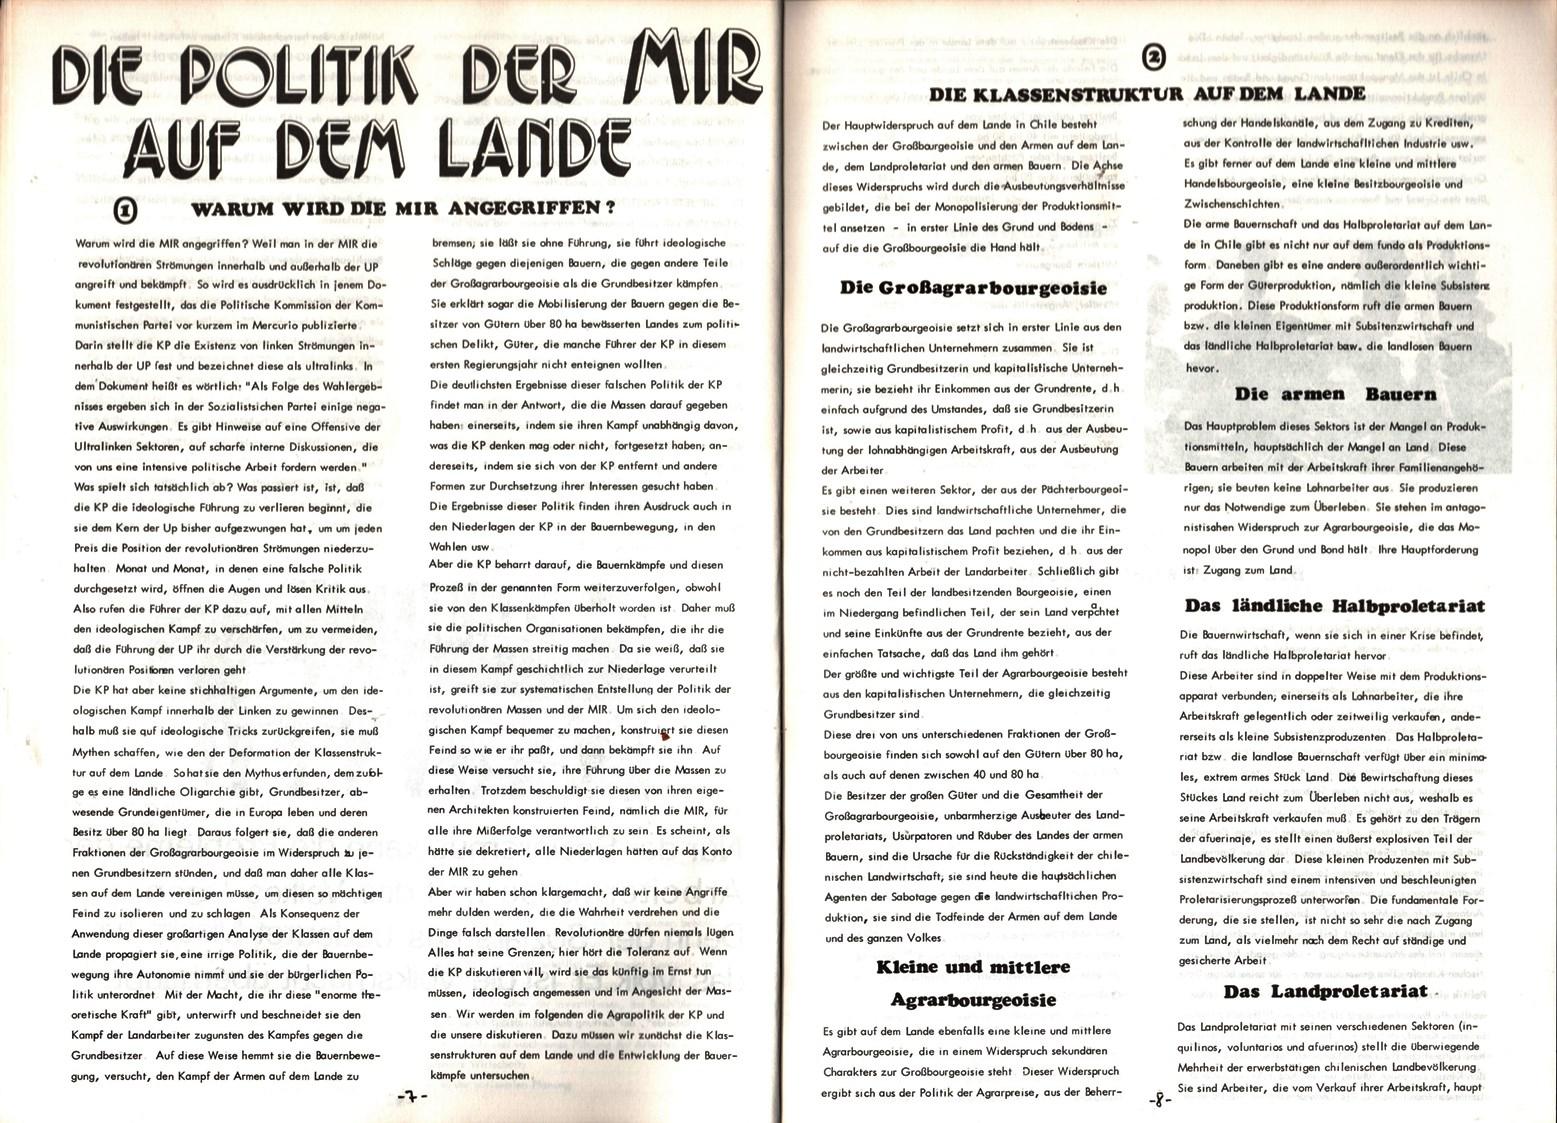 Lateinamerika_heute_Sonderbericht_Chile_Nr_04_007